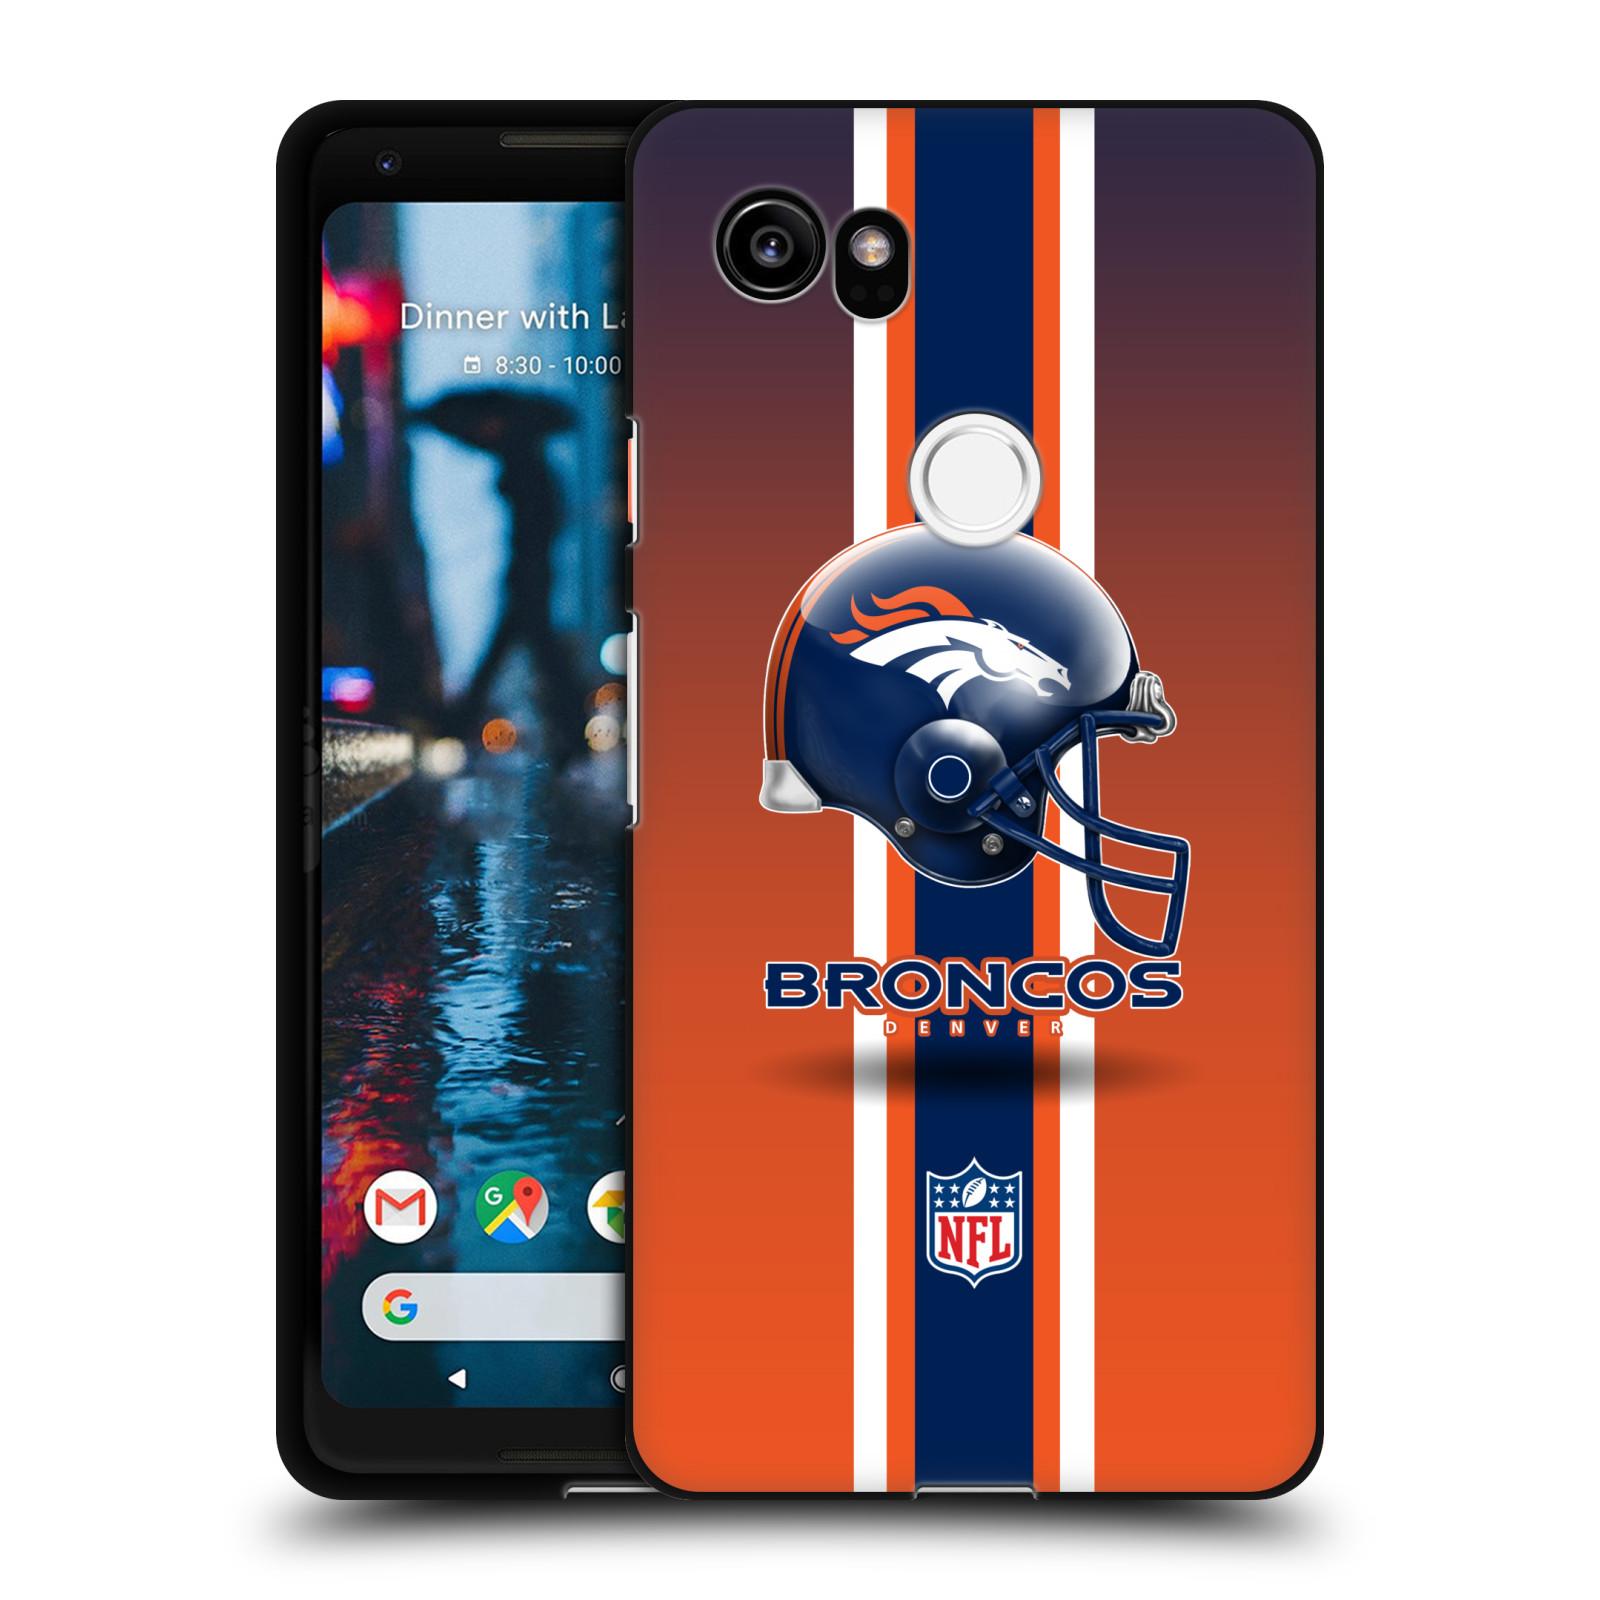 UFFICIALE-NFL-DENVER-BRONCOS-LOGO-COVER-IN-MORBIDO-GEL-NERA-PER-GOOGLE-TELEFONI